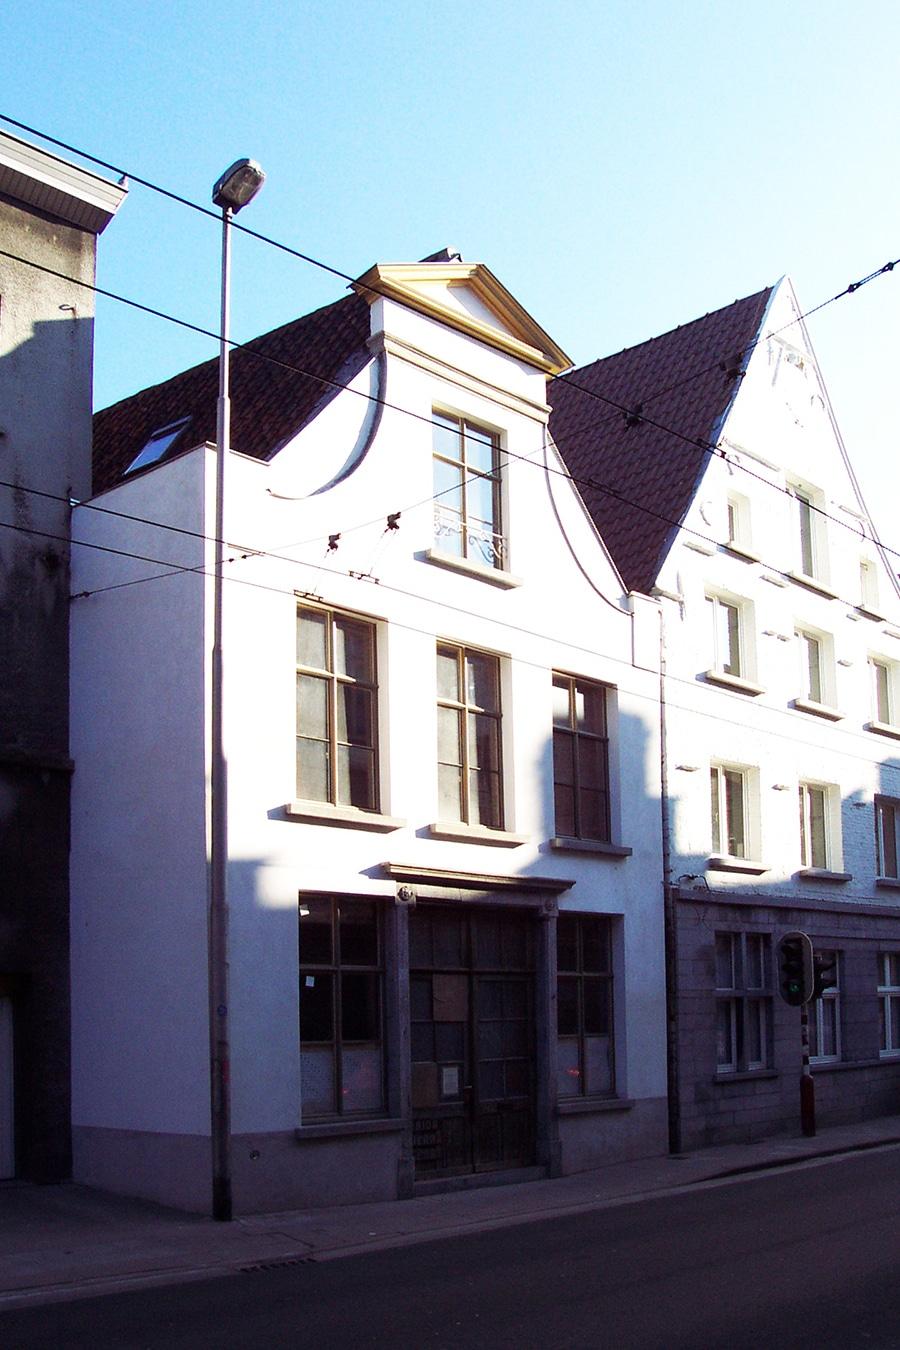 smis1 | Baeyens & Beck architecten Gent | architect nieuwbouw renovatie interieur | high end | architectenbureau